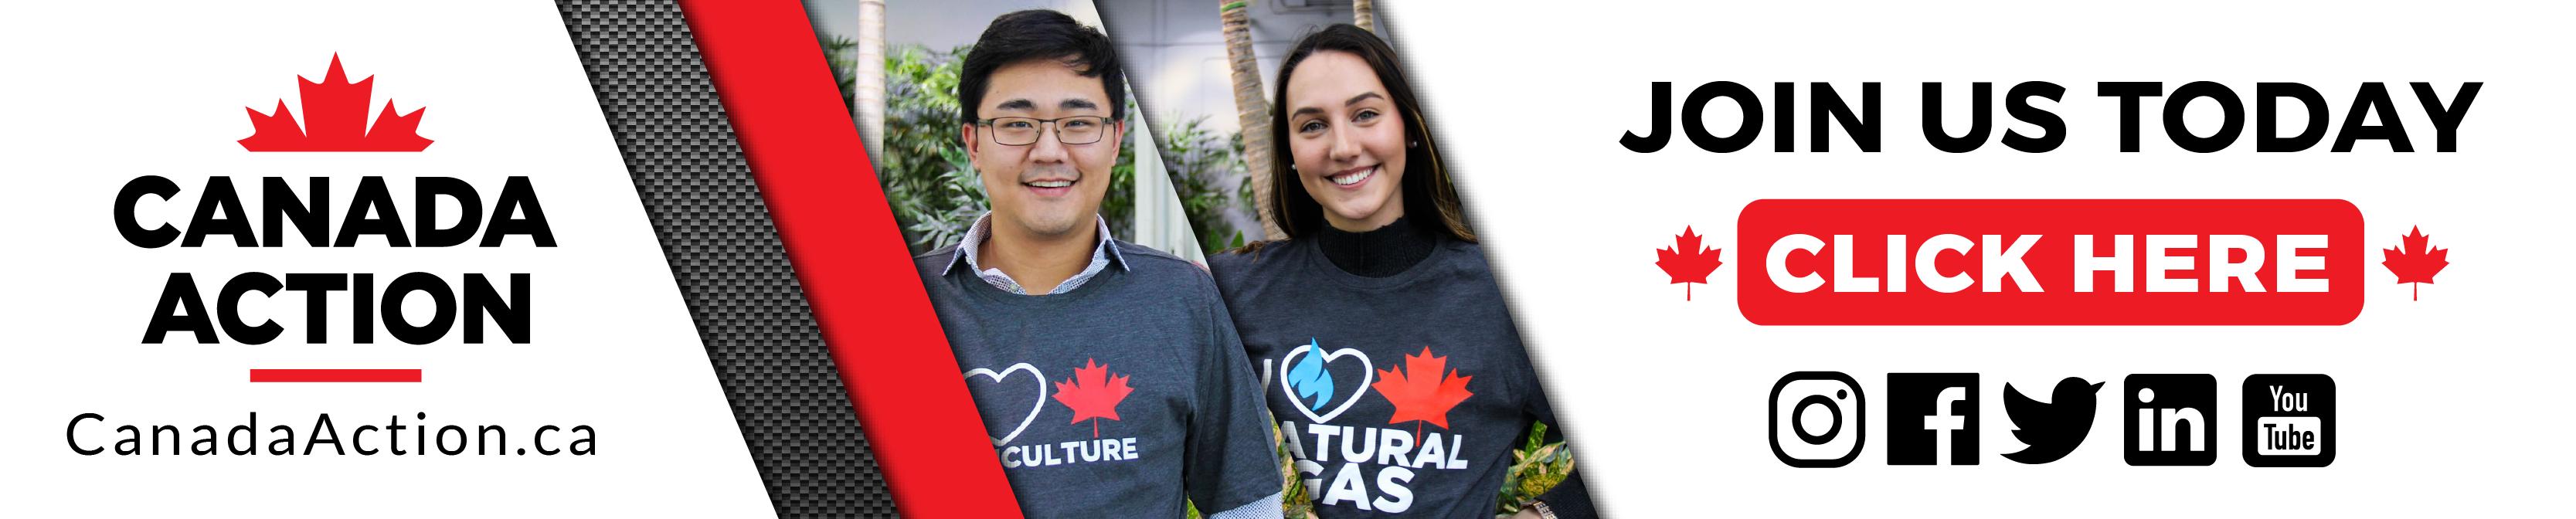 Canada Action Blog Banner 2